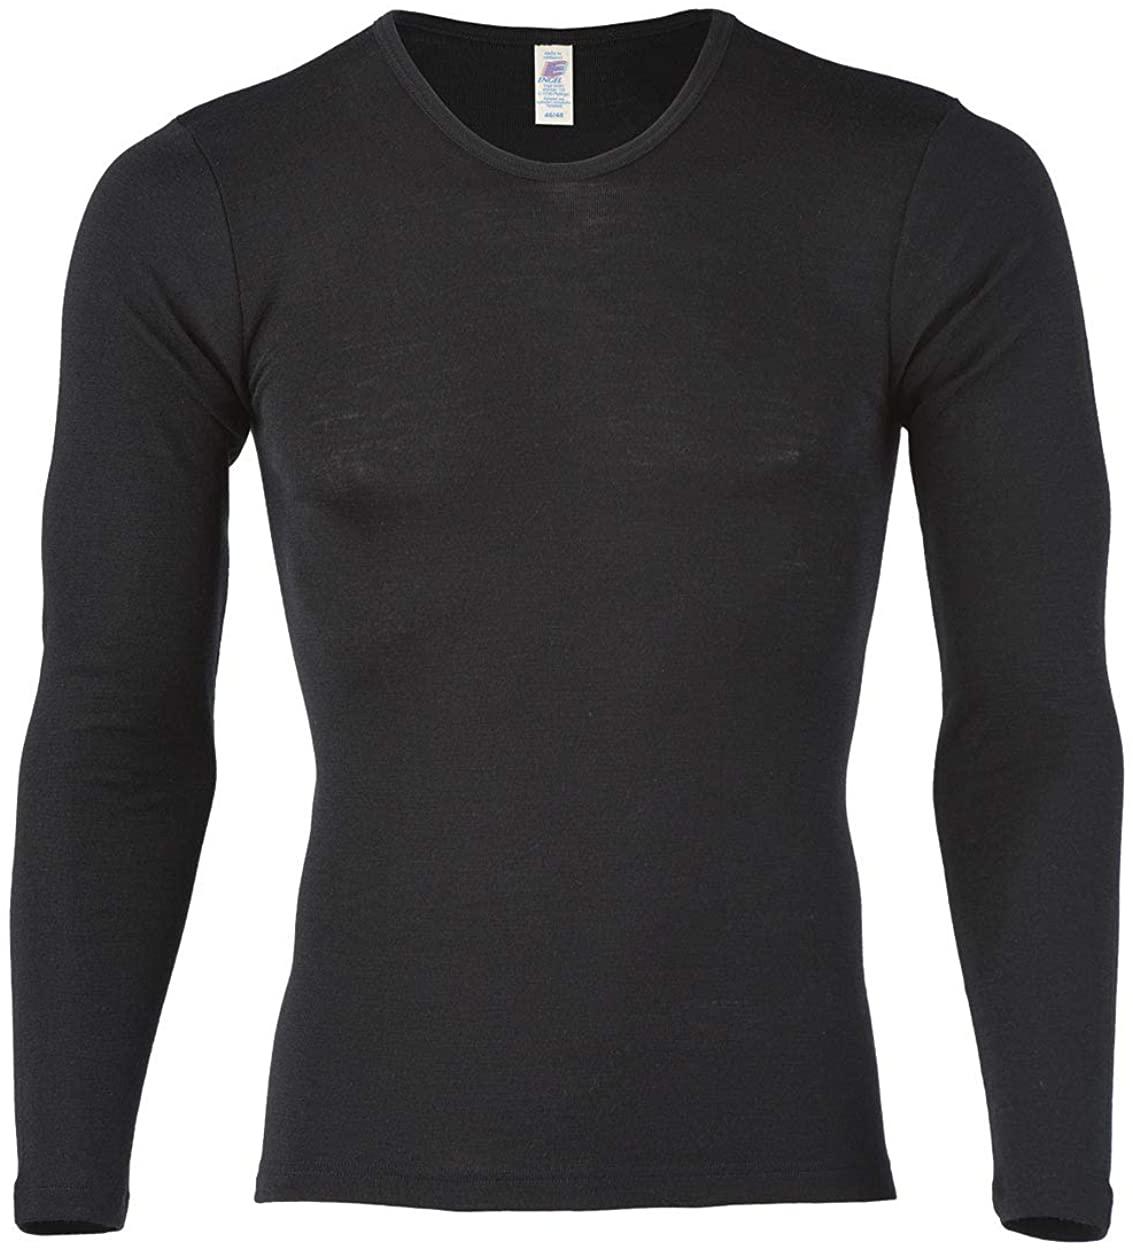 Engel 70% Organic Merino Wool 30% Silk Men's T-Shirt Long Sleeved. Made in Germany.